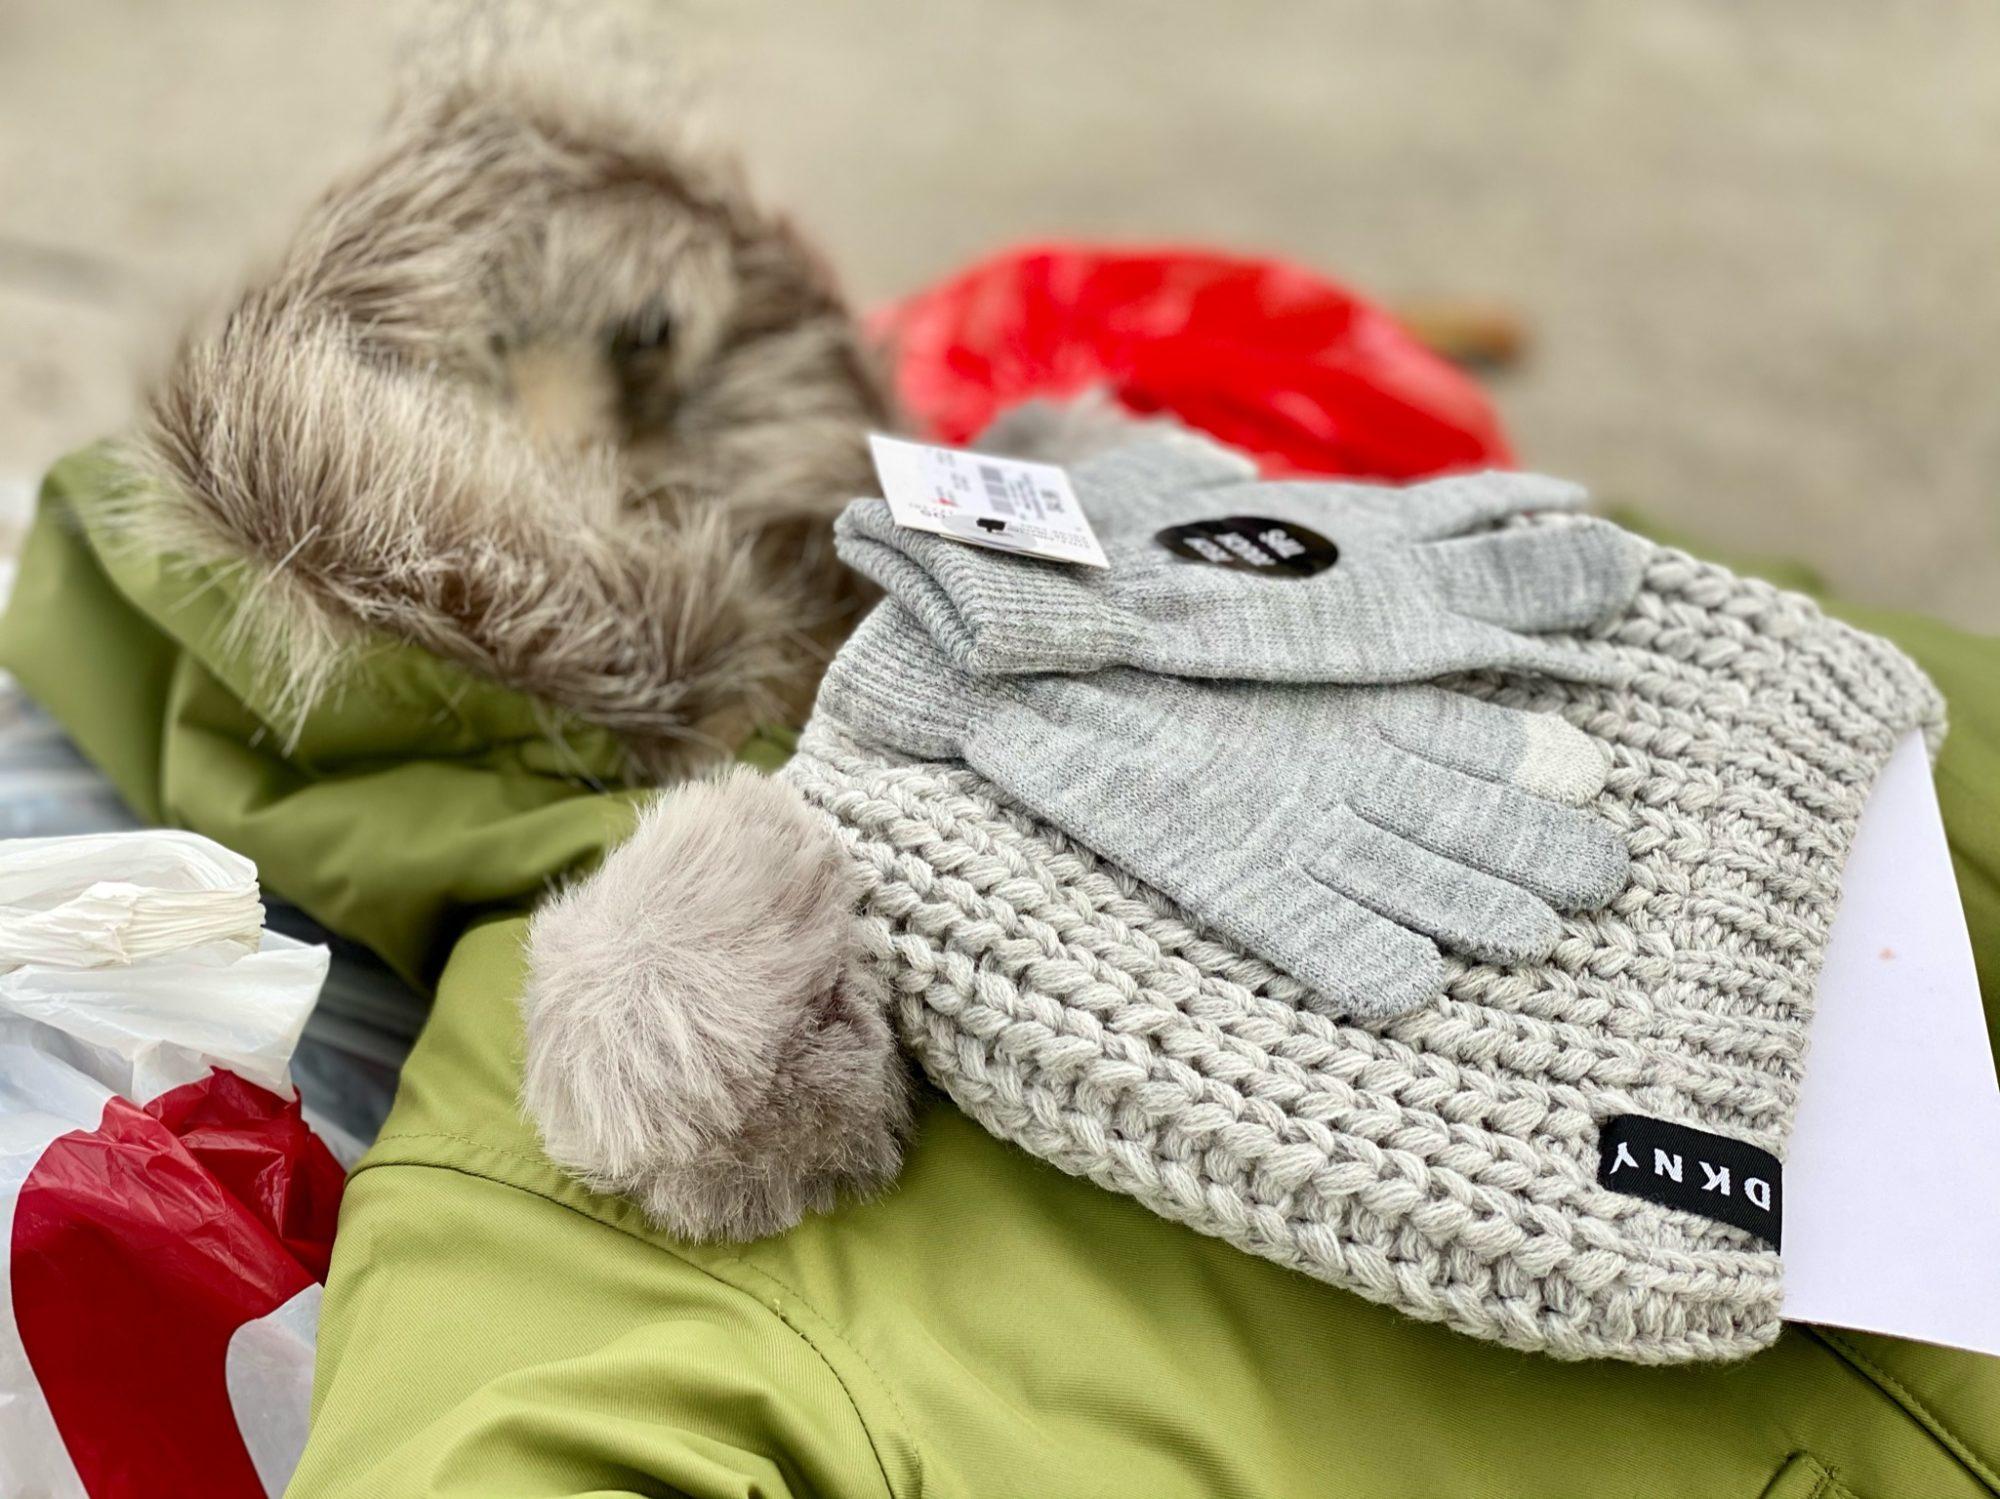 One coat, two coats, red coat, blue coat: providing 150 coats for kids this winter